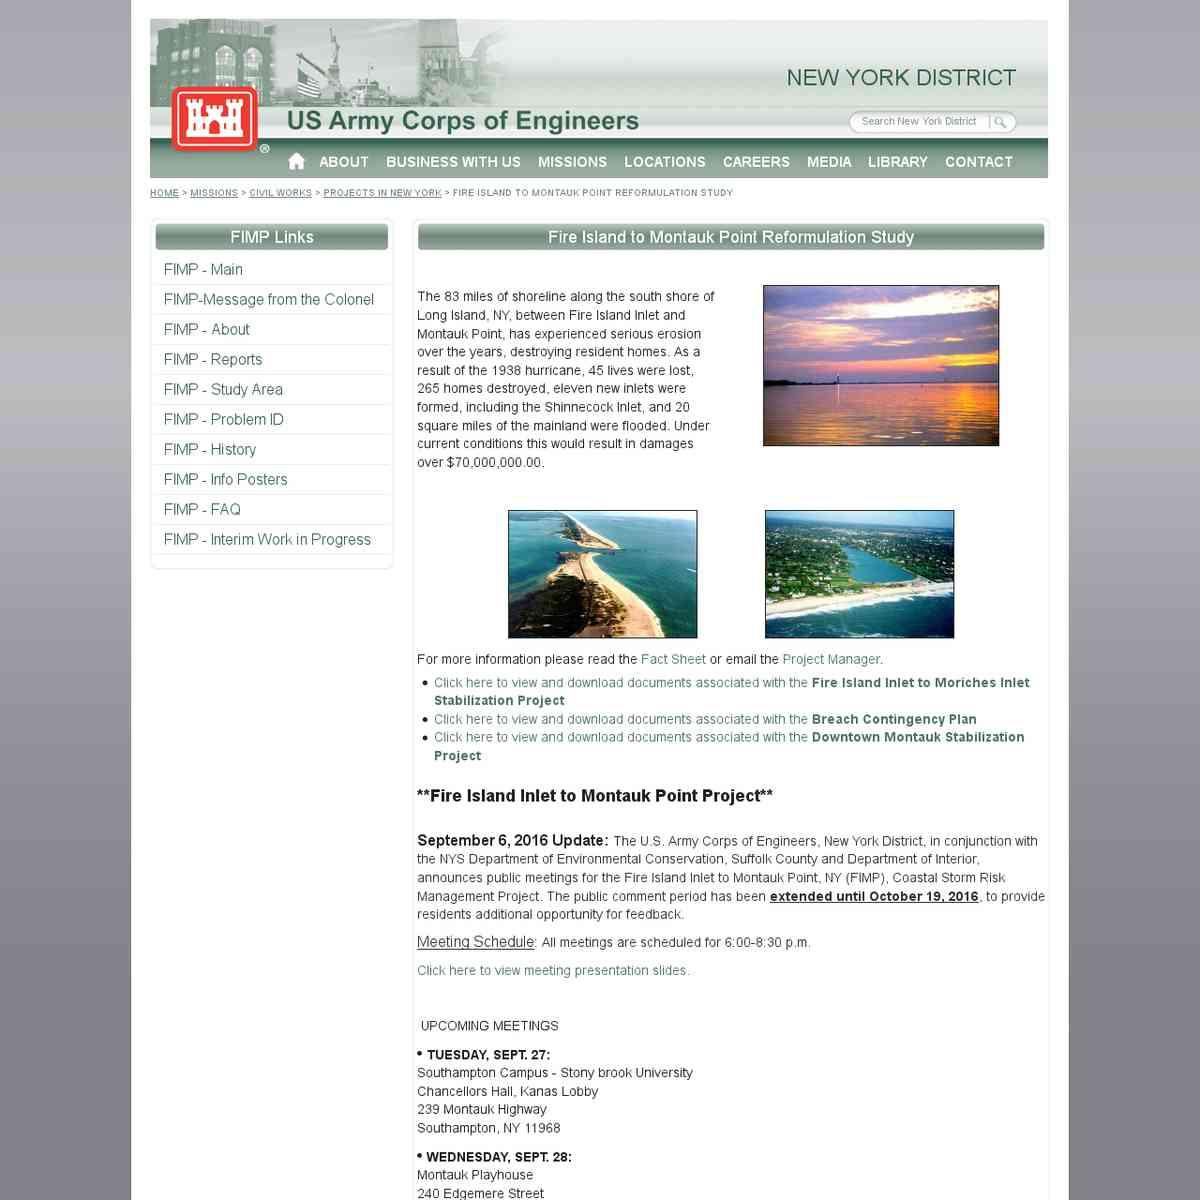 Fire Island to Montauk Point Reformulation Study